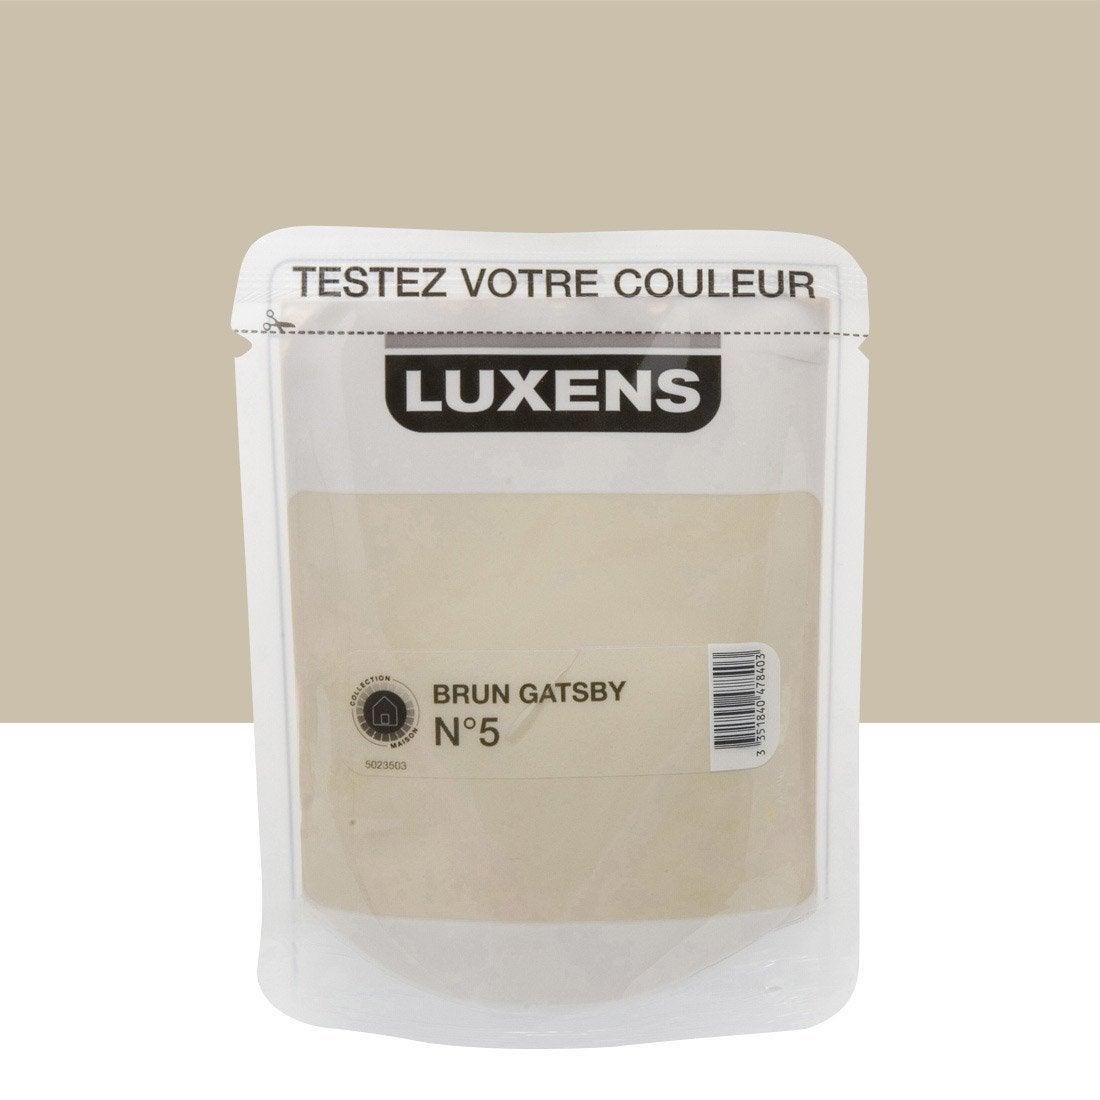 Testeur peinture brun gatsby 5 luxens couleurs int rieures satin l leroy merlin for Peintures interieures leroy merlin